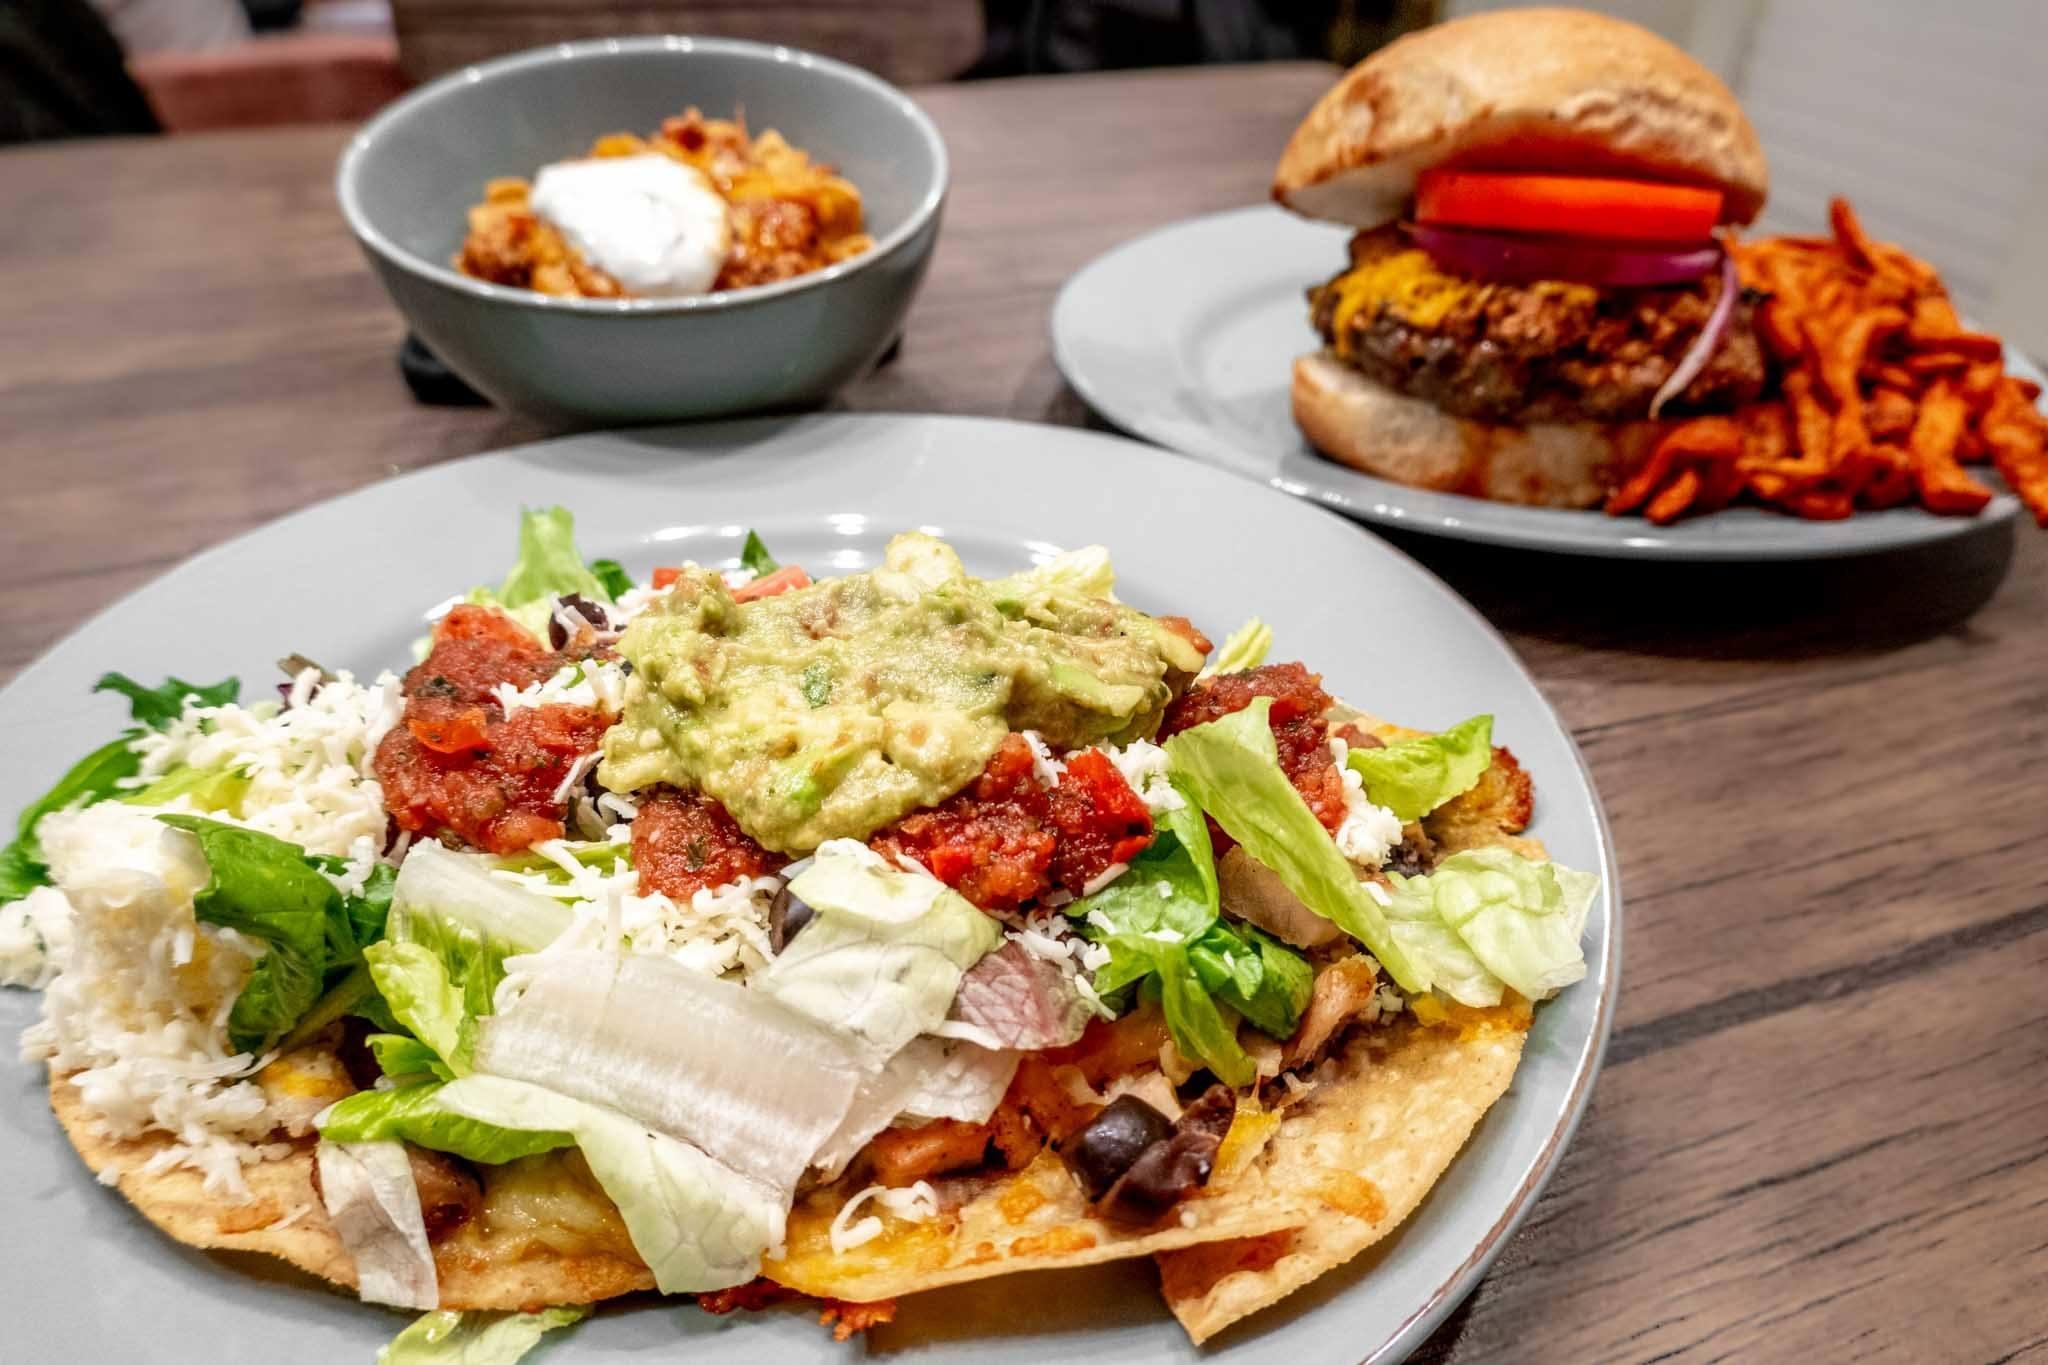 Salad, hamburger, and bowl of Frito Pie on a table